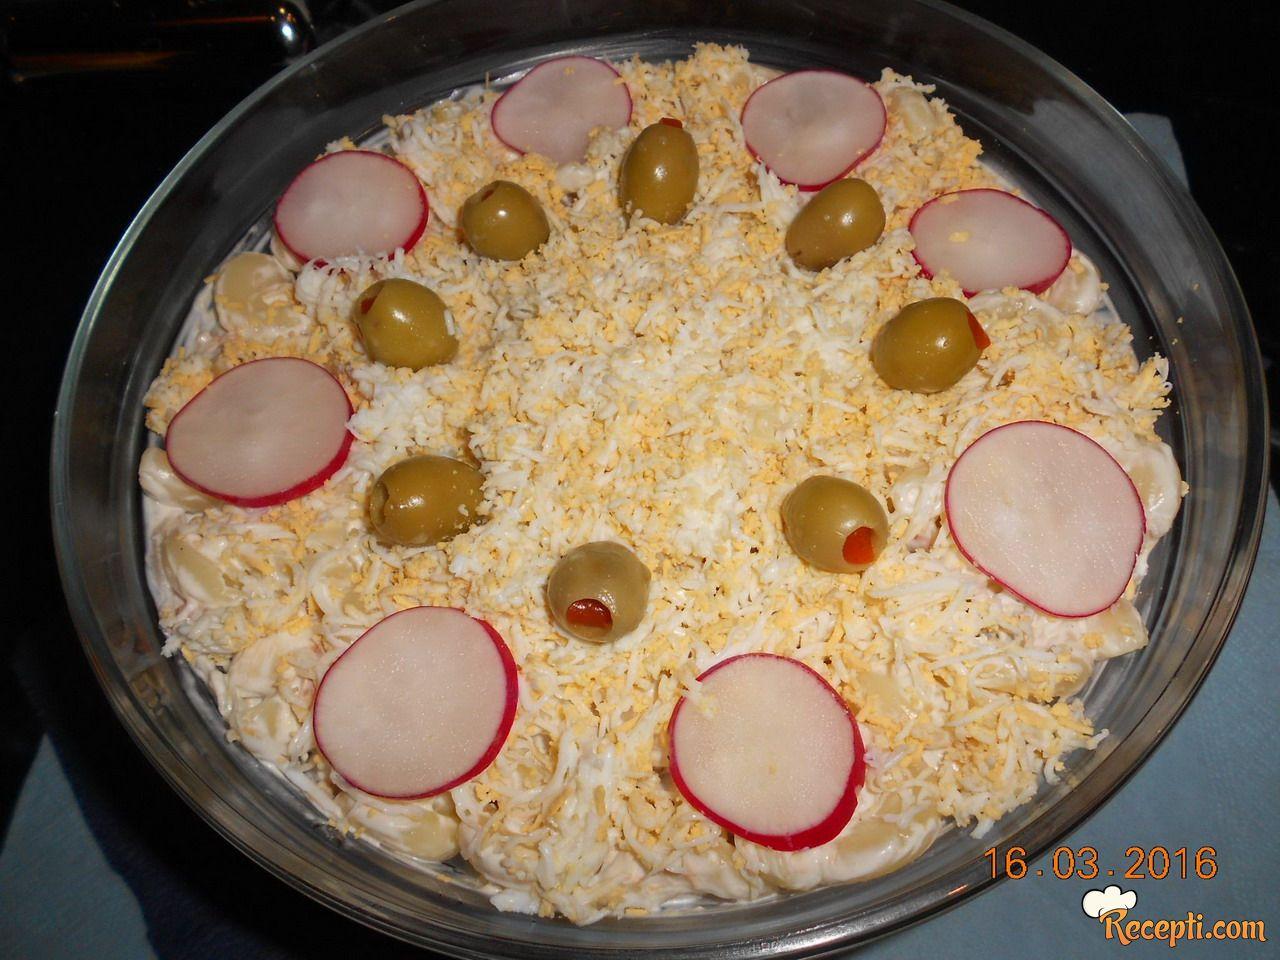 Pileća salata sa makaronama